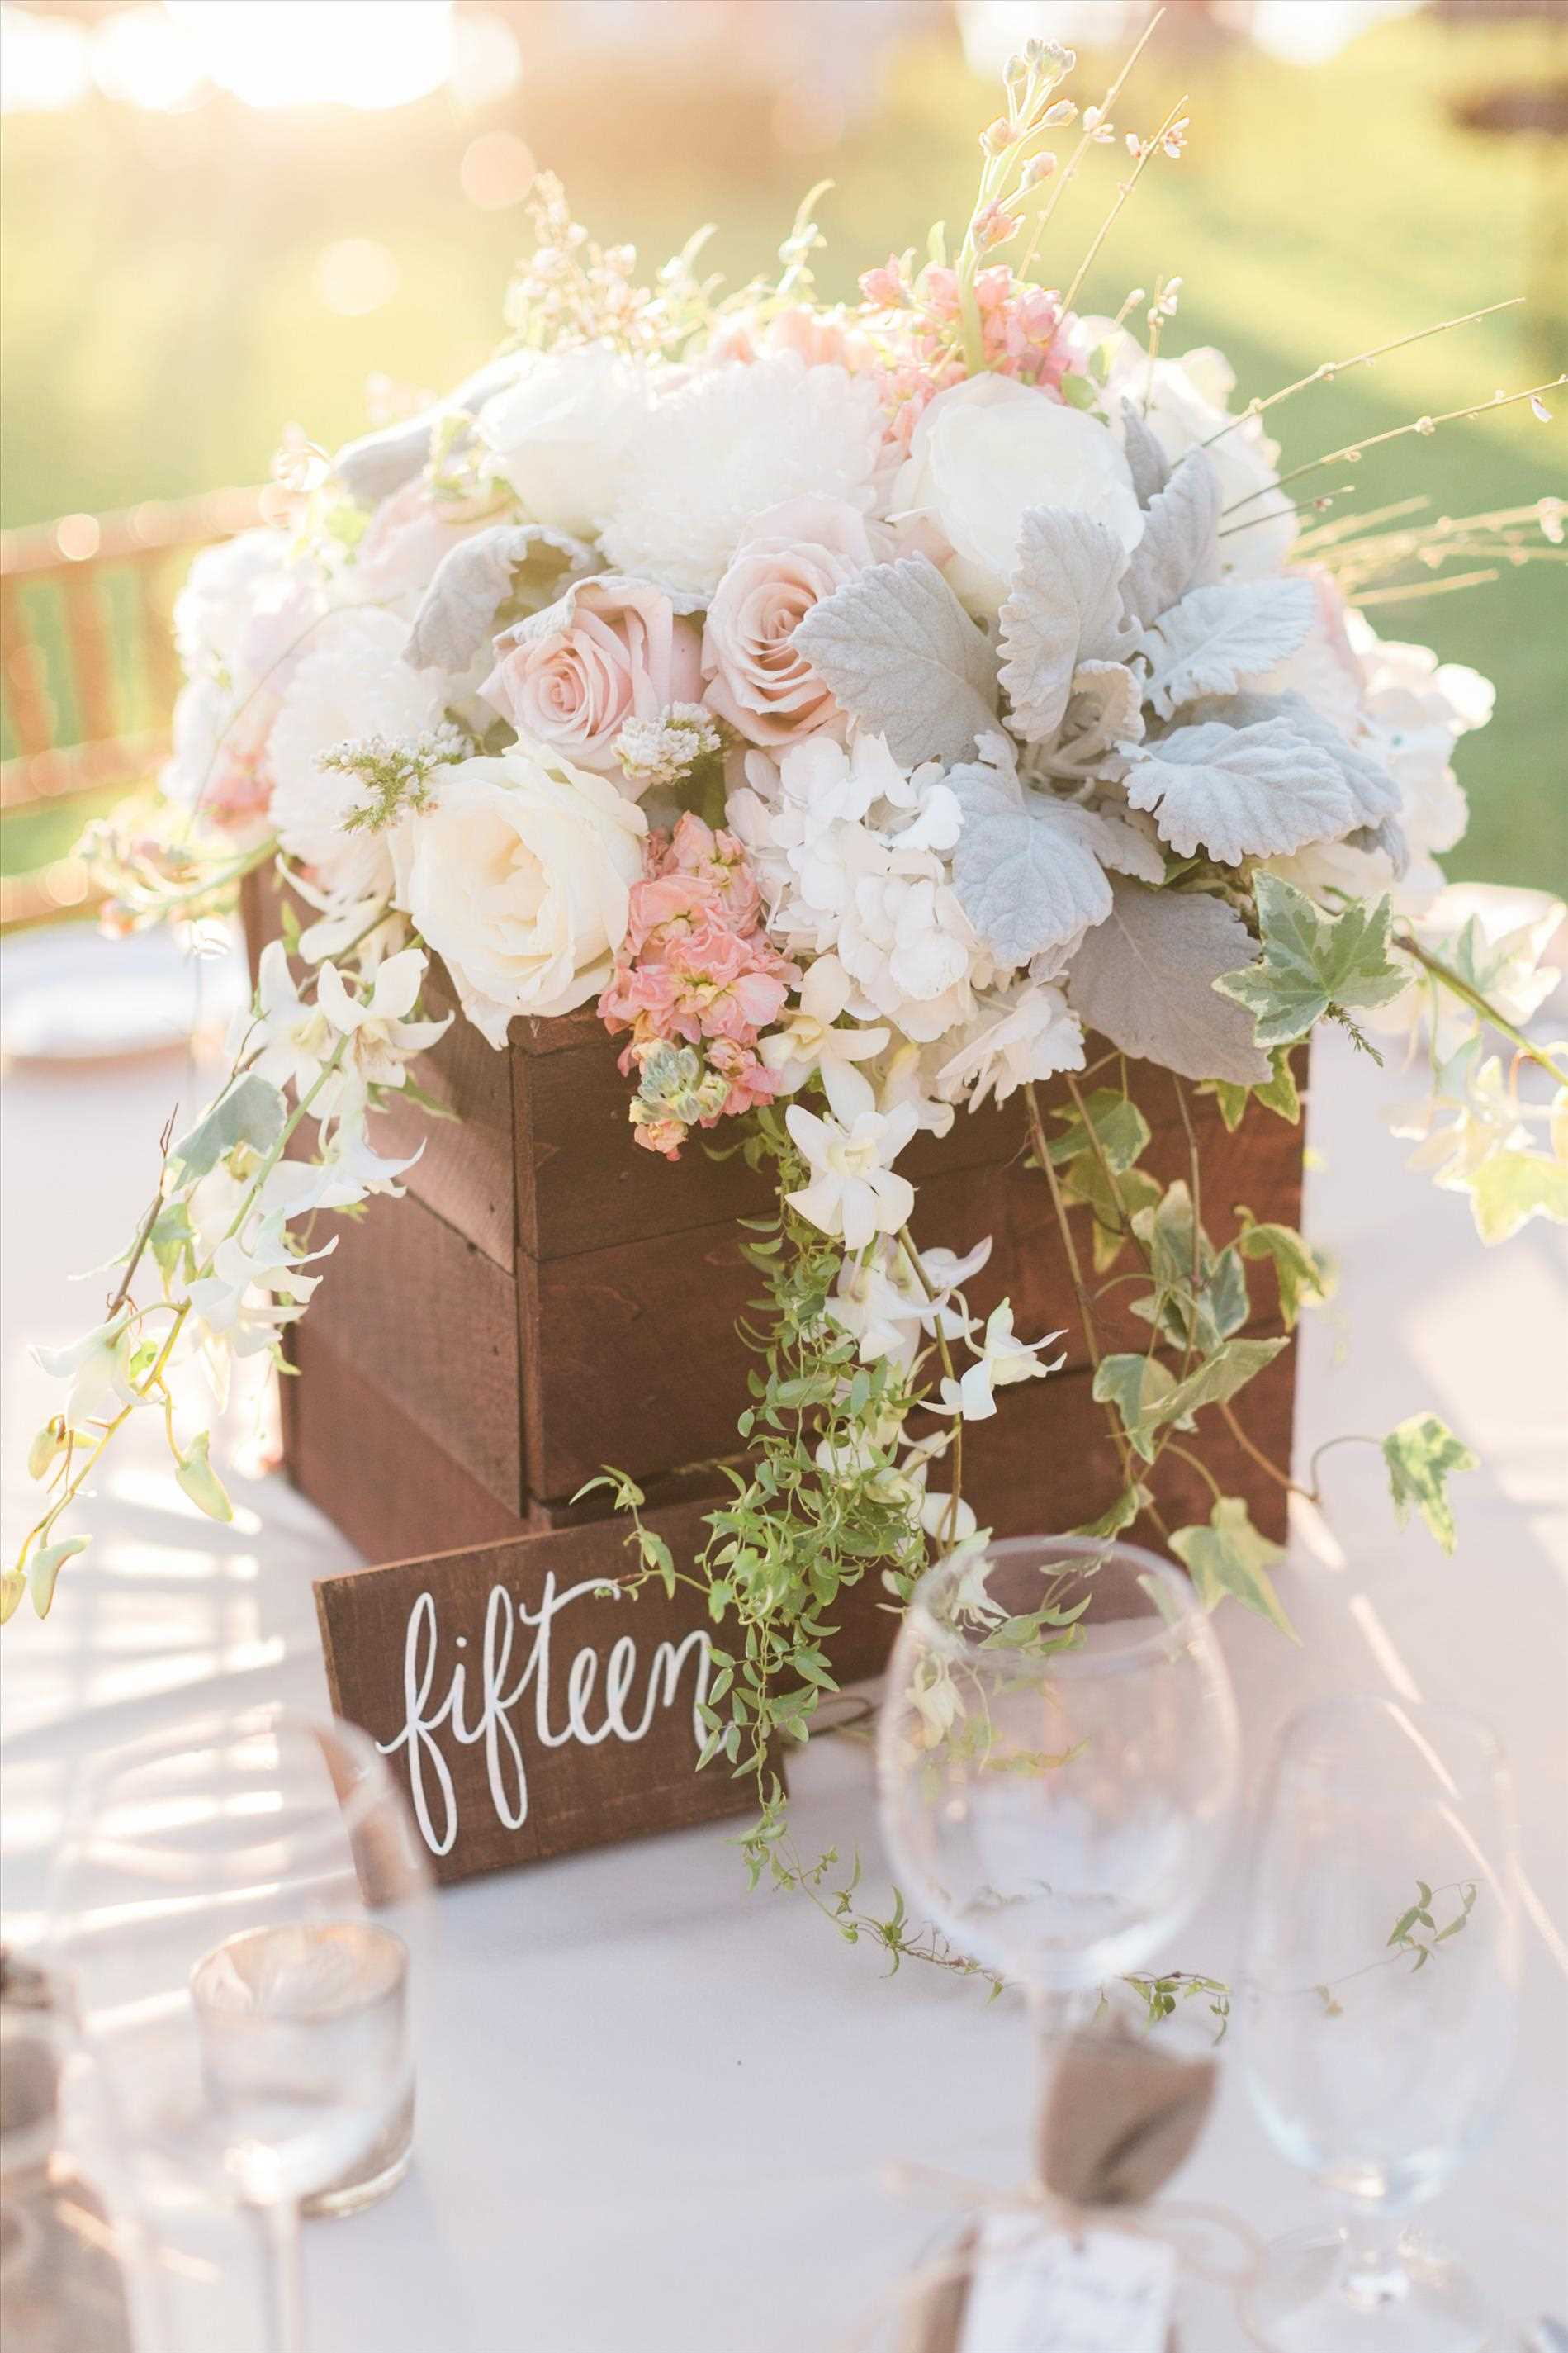 Flower-Arrangement-Ideas-Wedding-flowers-ideas-beautiful-purple-spring-flower-design-wedding-Flower-Arrangement-Ideas-Wedding.jpg